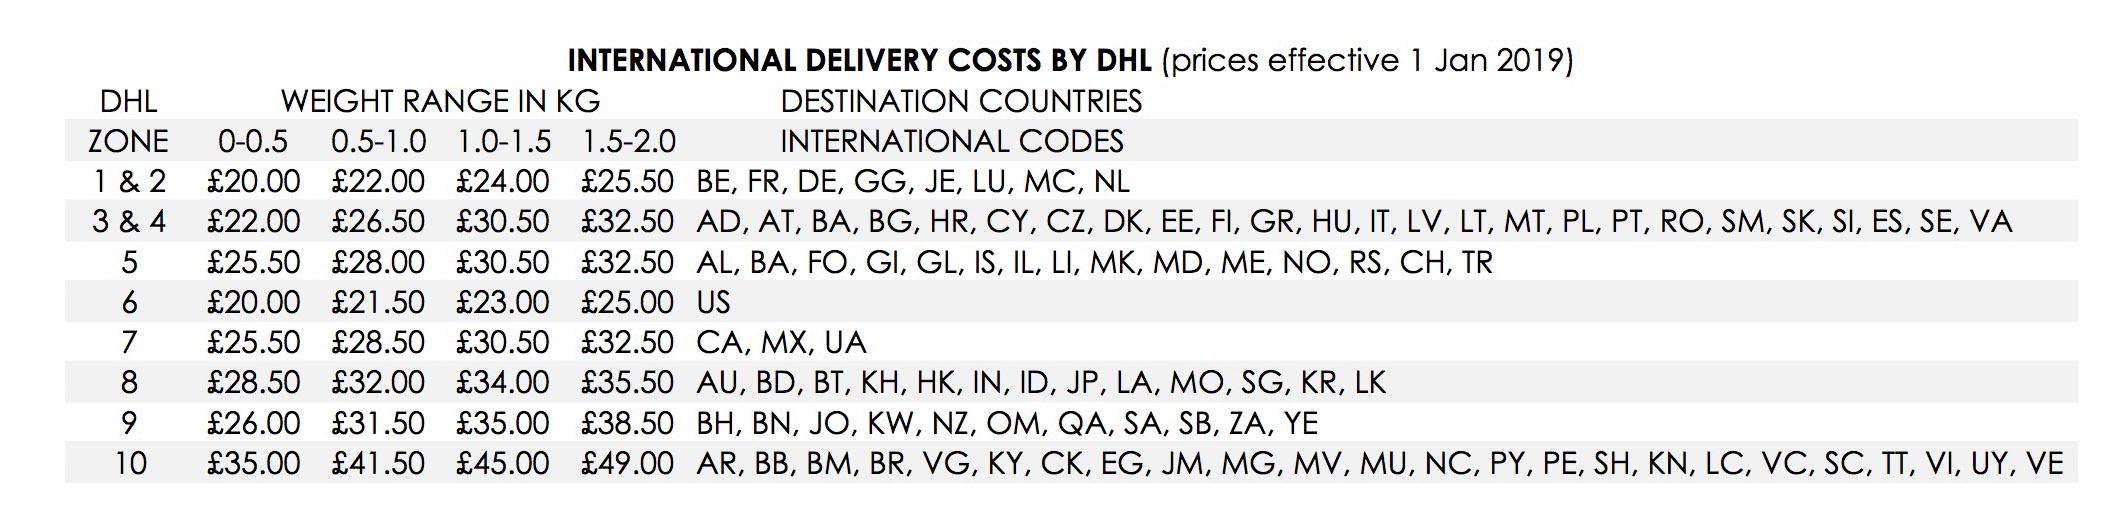 zoe alexander boys girls tennis clothes dhl shipping costs international